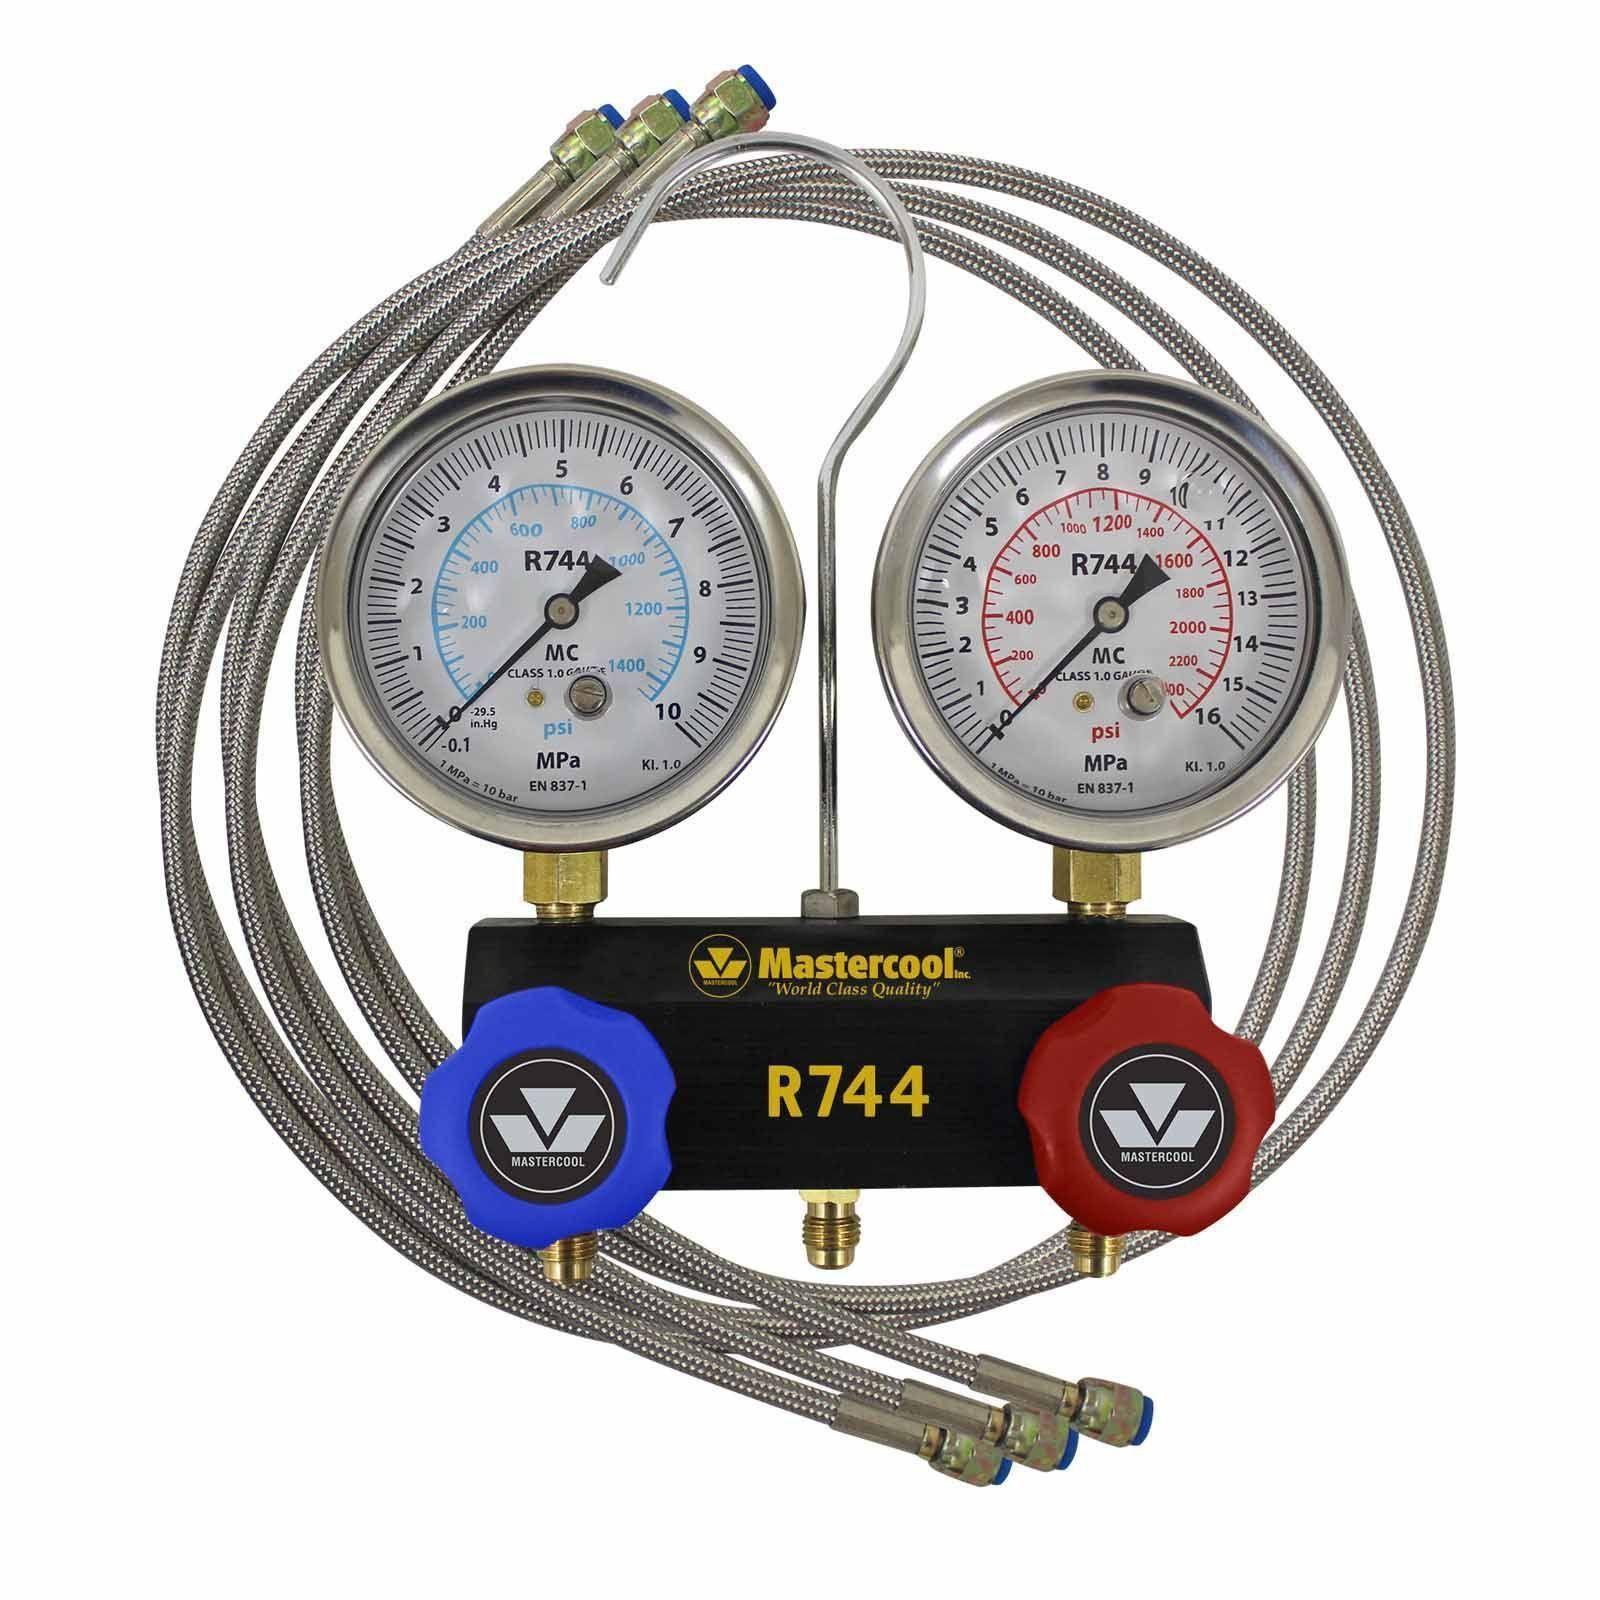 Manifold Pressão C02 R744 Mangueira Trançada 150cm 55661 Mastercool